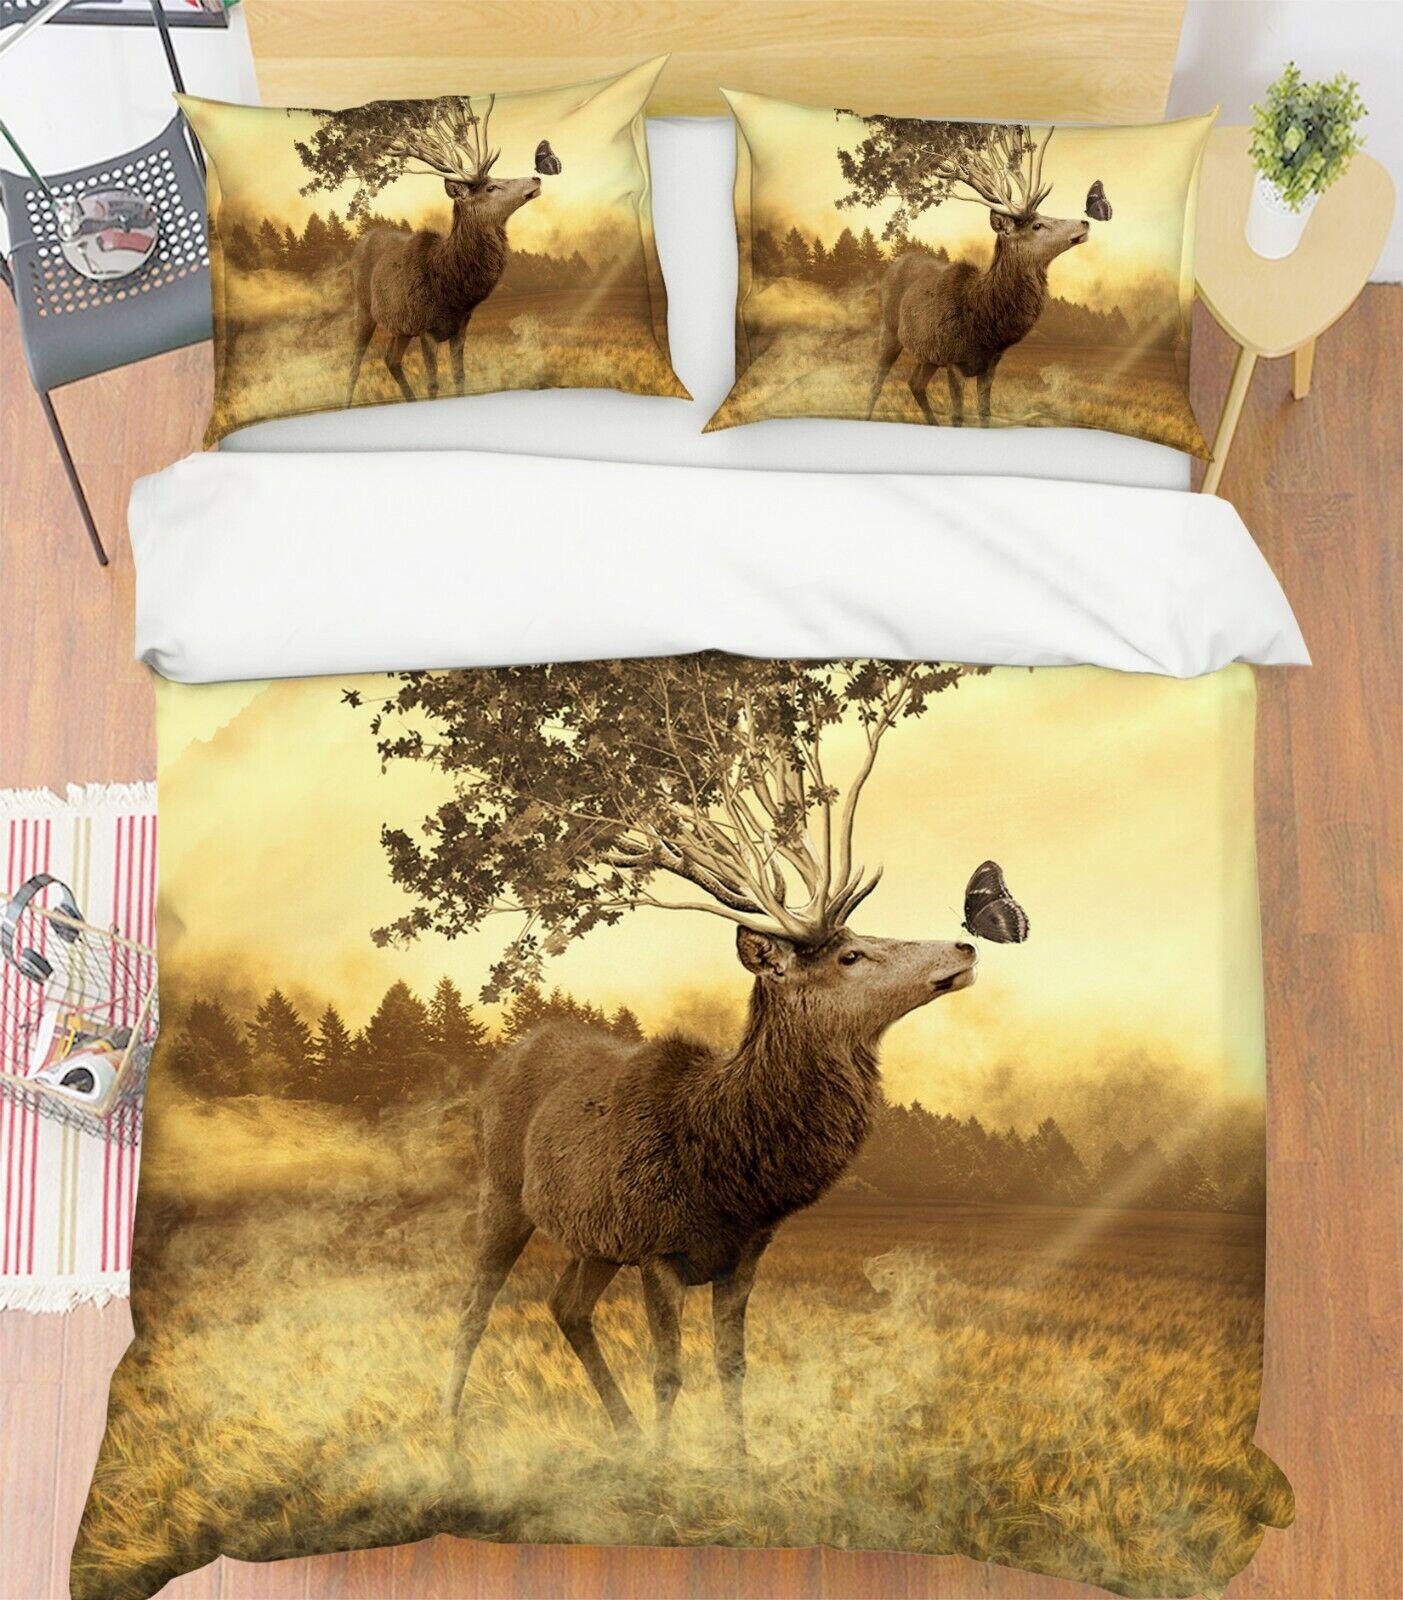 3D Hirsch Tree R126 Animal Bed Pillowcases Quilt Duvet Cover Queen King Zoe